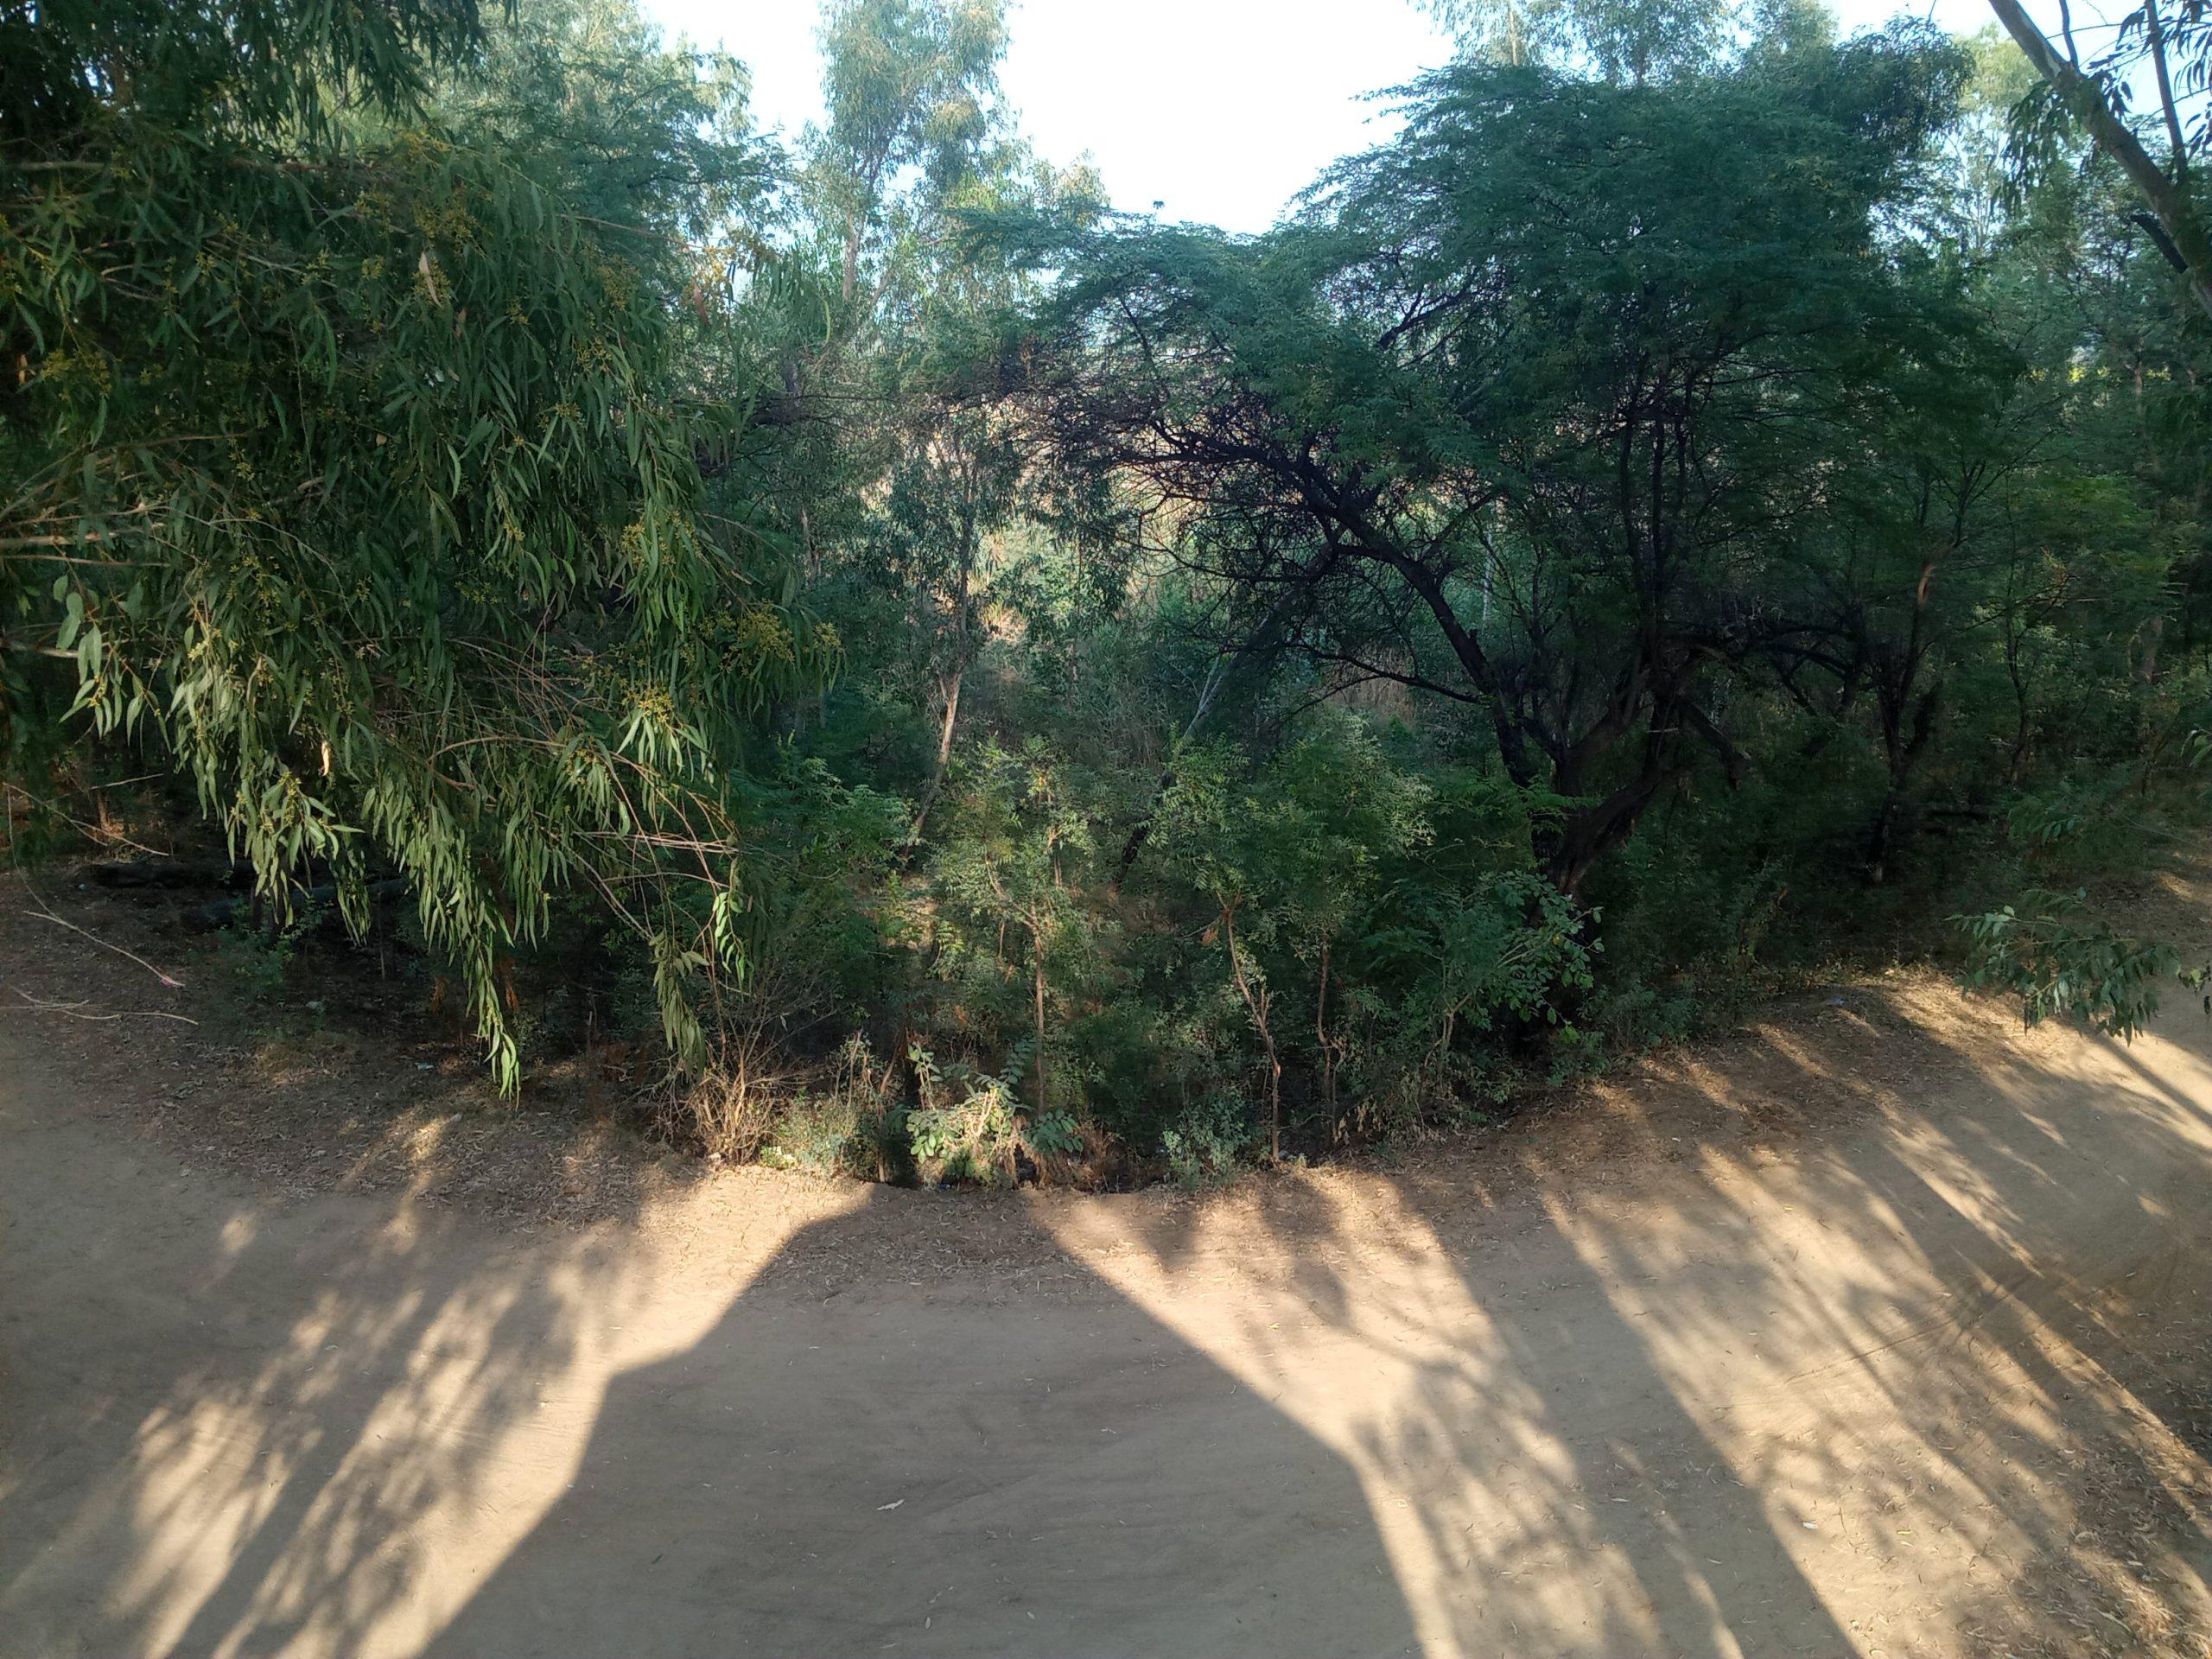 Image Of Dirt Image